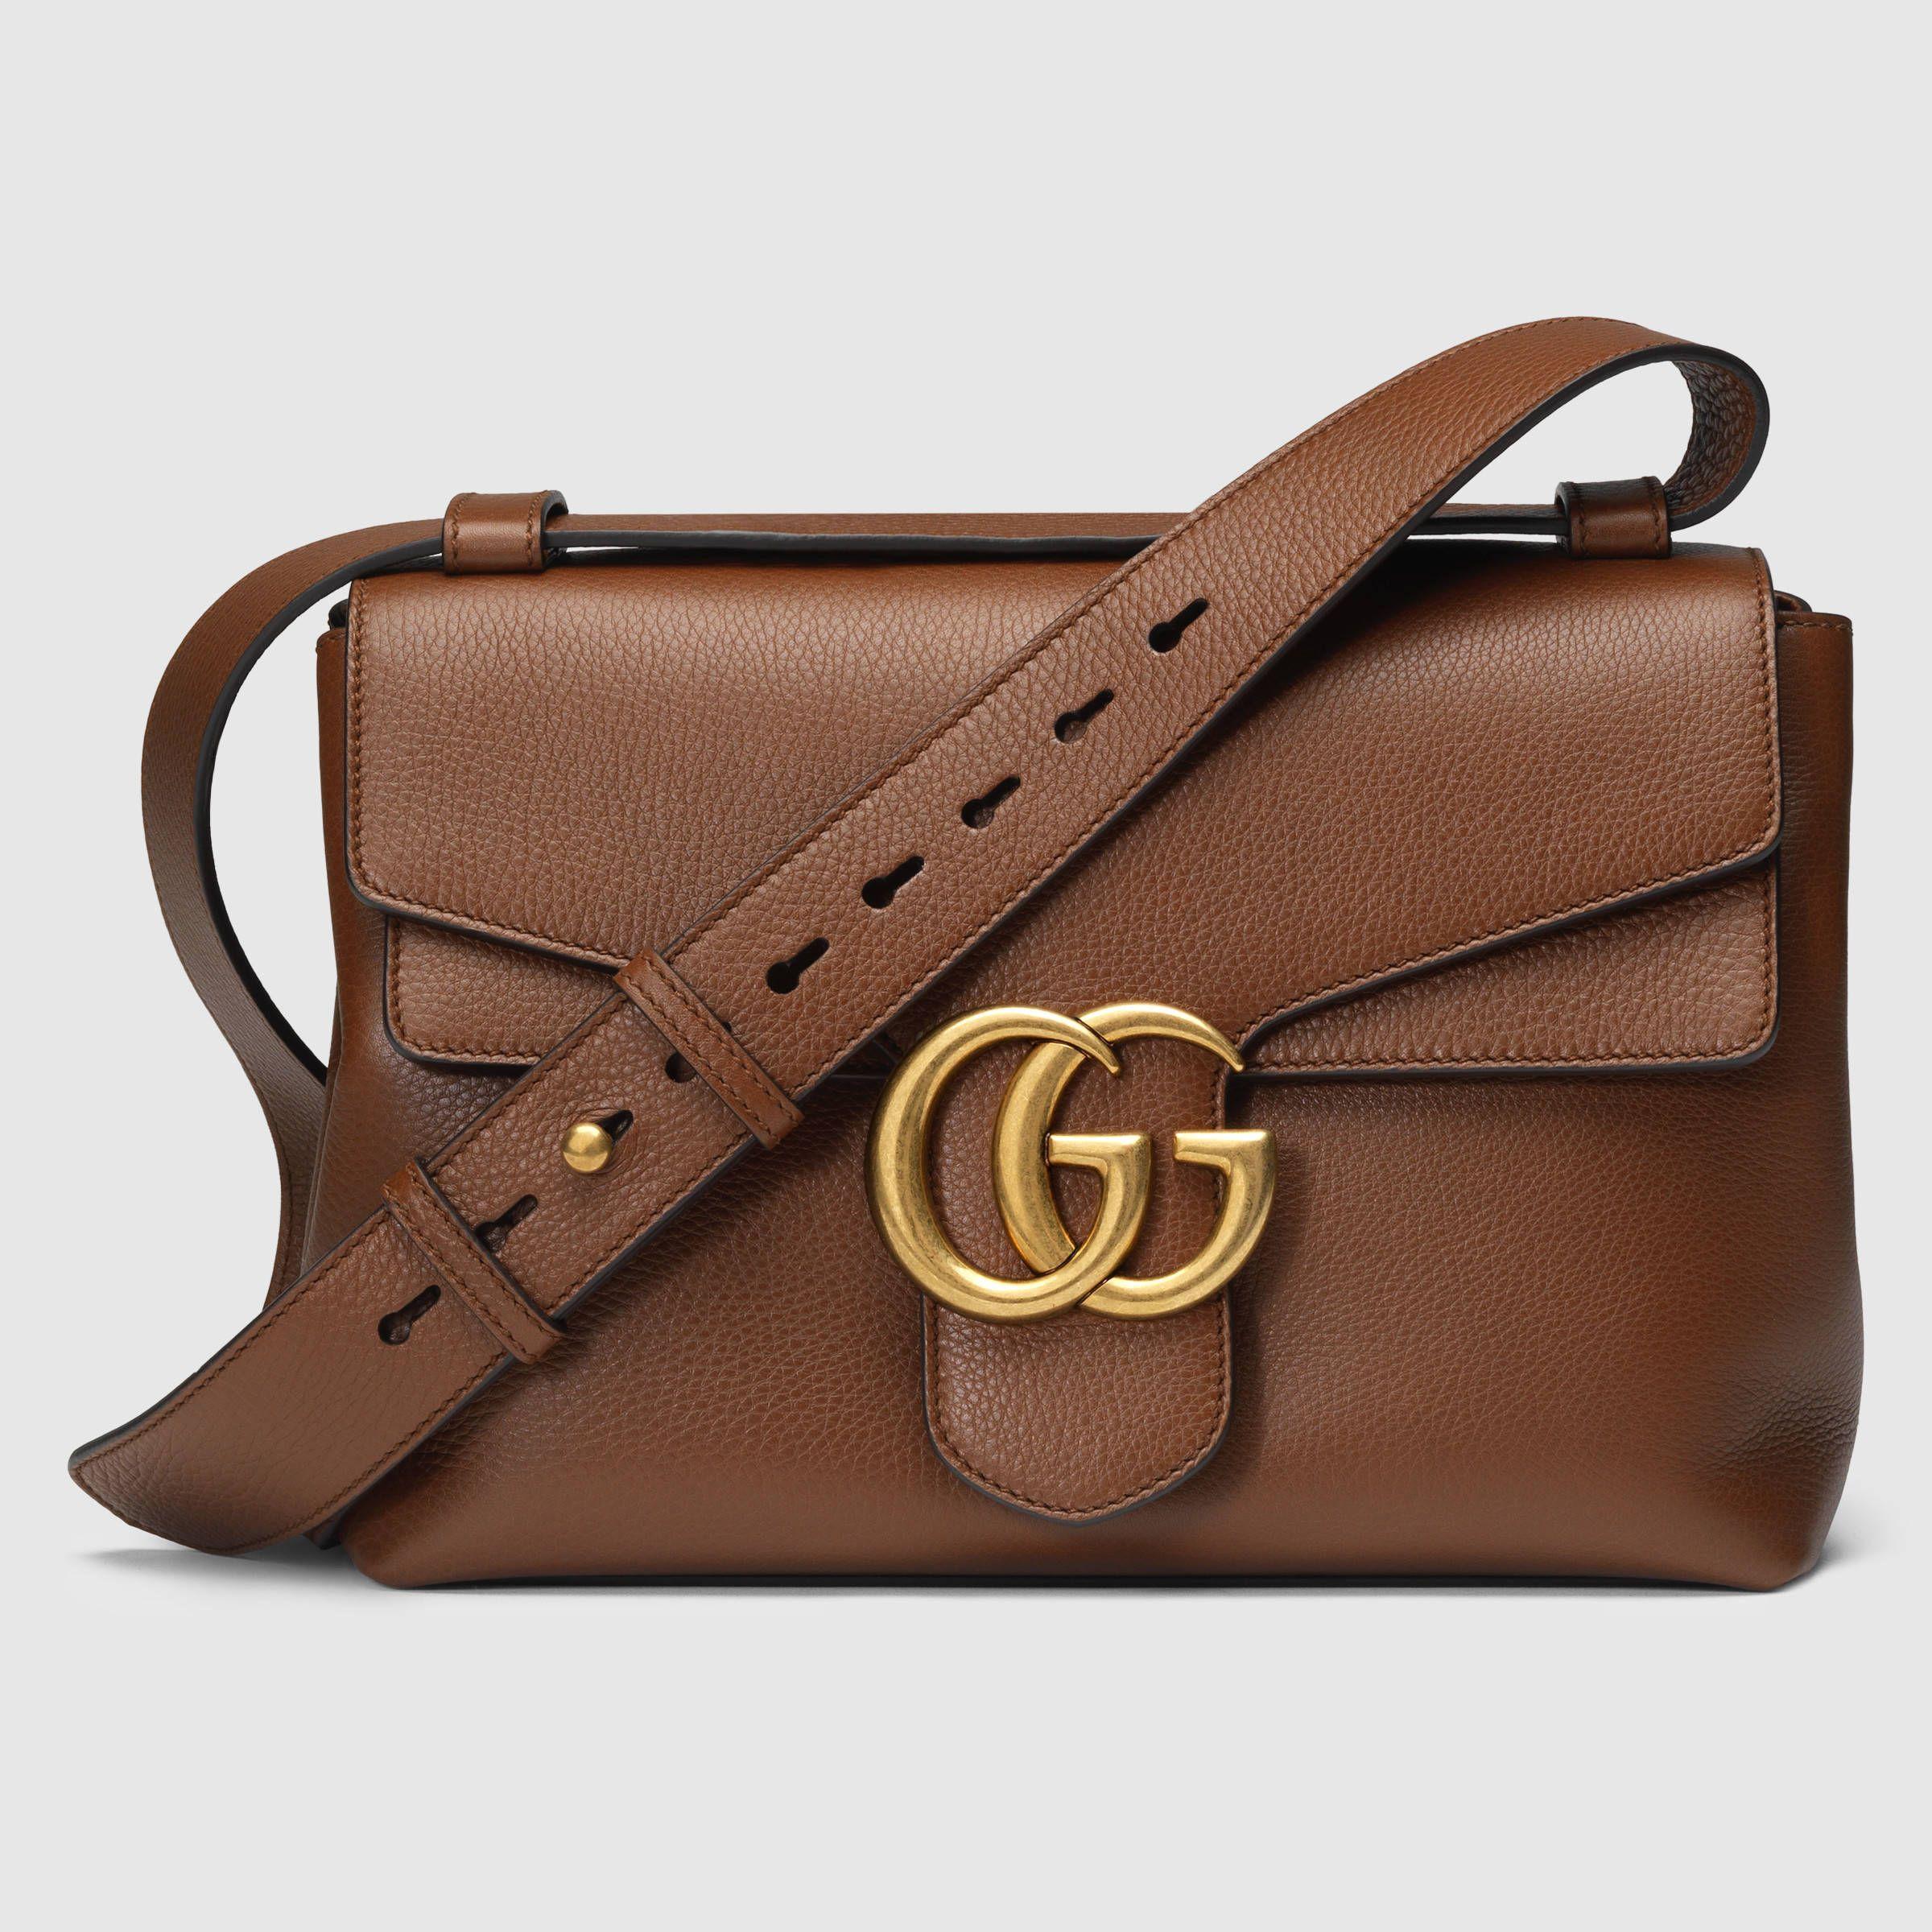 c829bf4c04 Gucci Women GG Marmont leather shoulder bag t